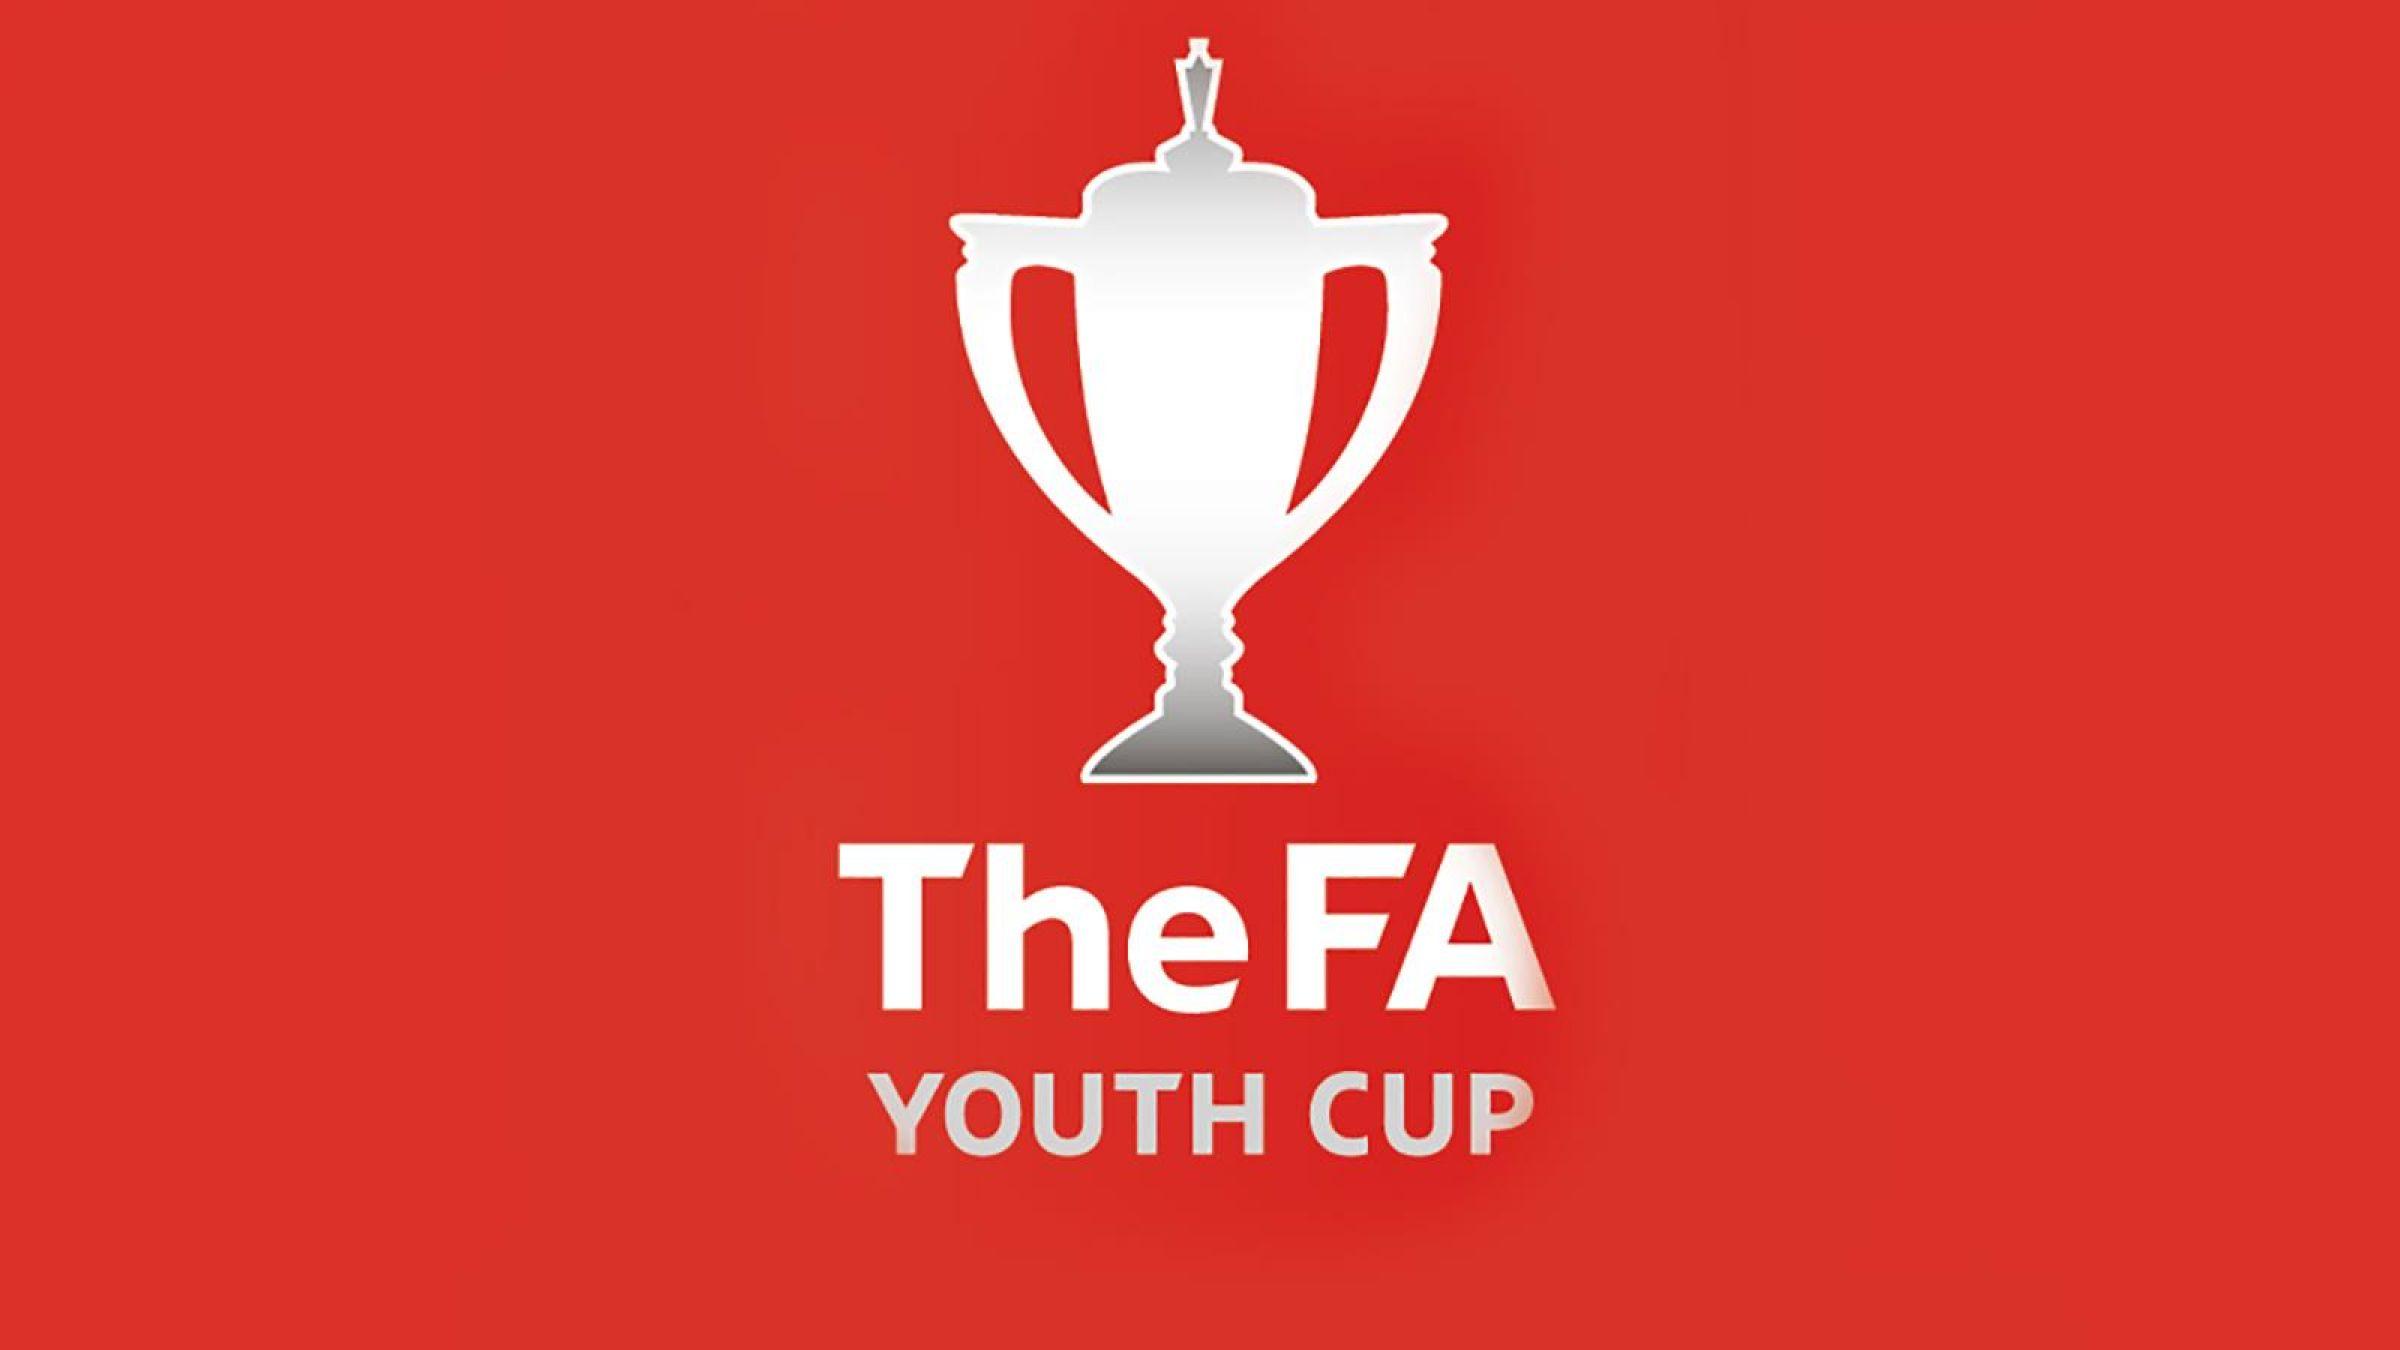 fa-youth-cup-logo-169543-3466159_1600x900